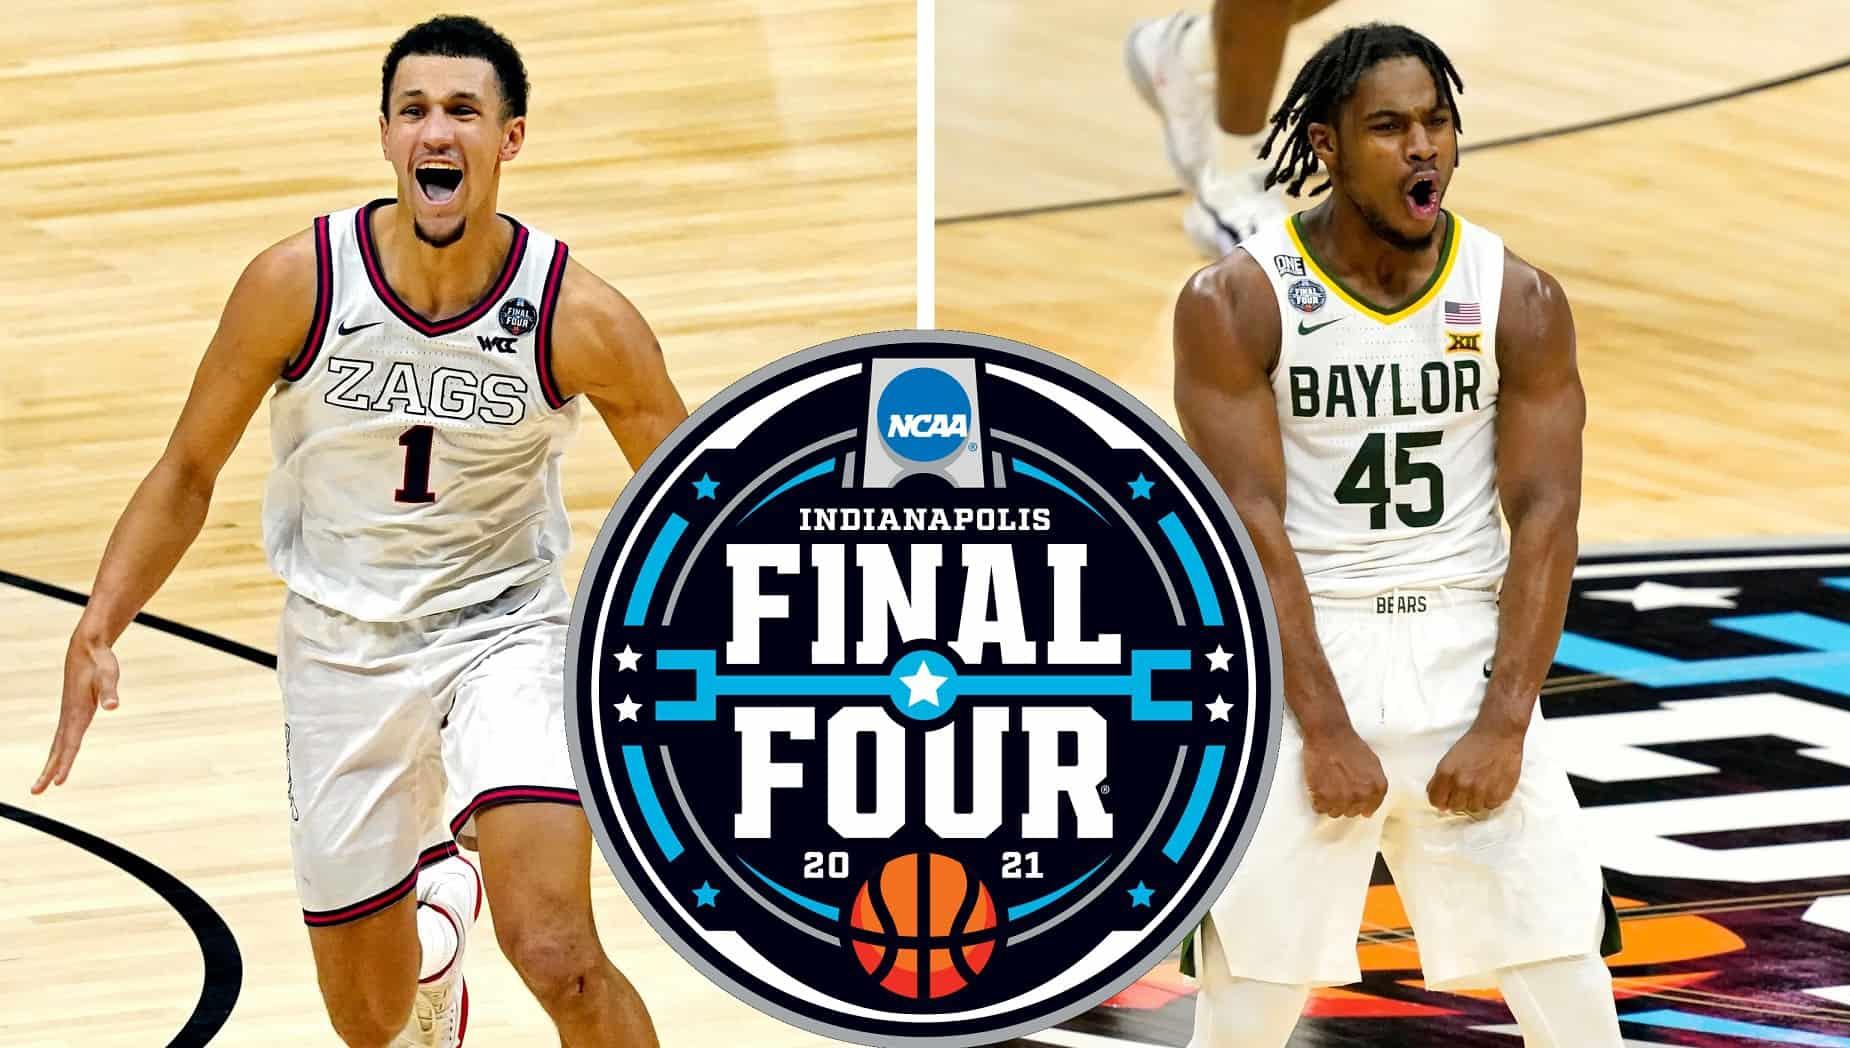 Gonzaga Baylor Finale NCAA